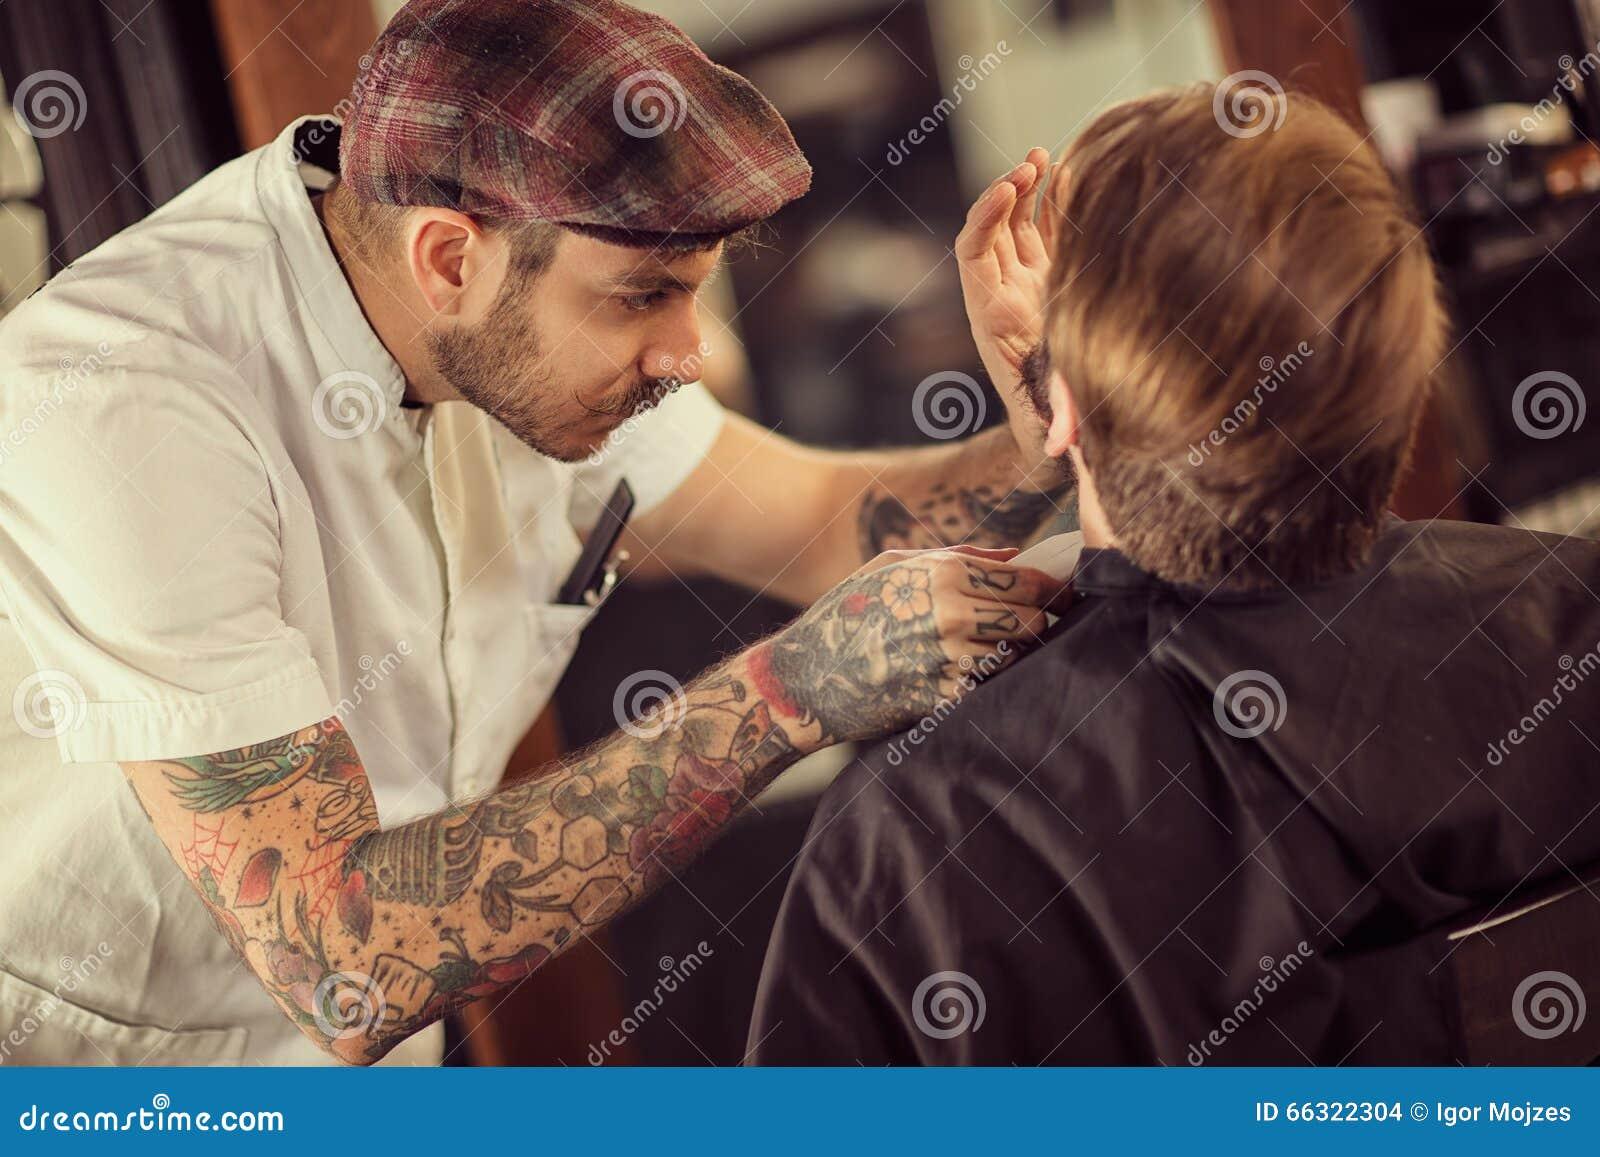 barber shaving beard stock photo image 66322304. Black Bedroom Furniture Sets. Home Design Ideas